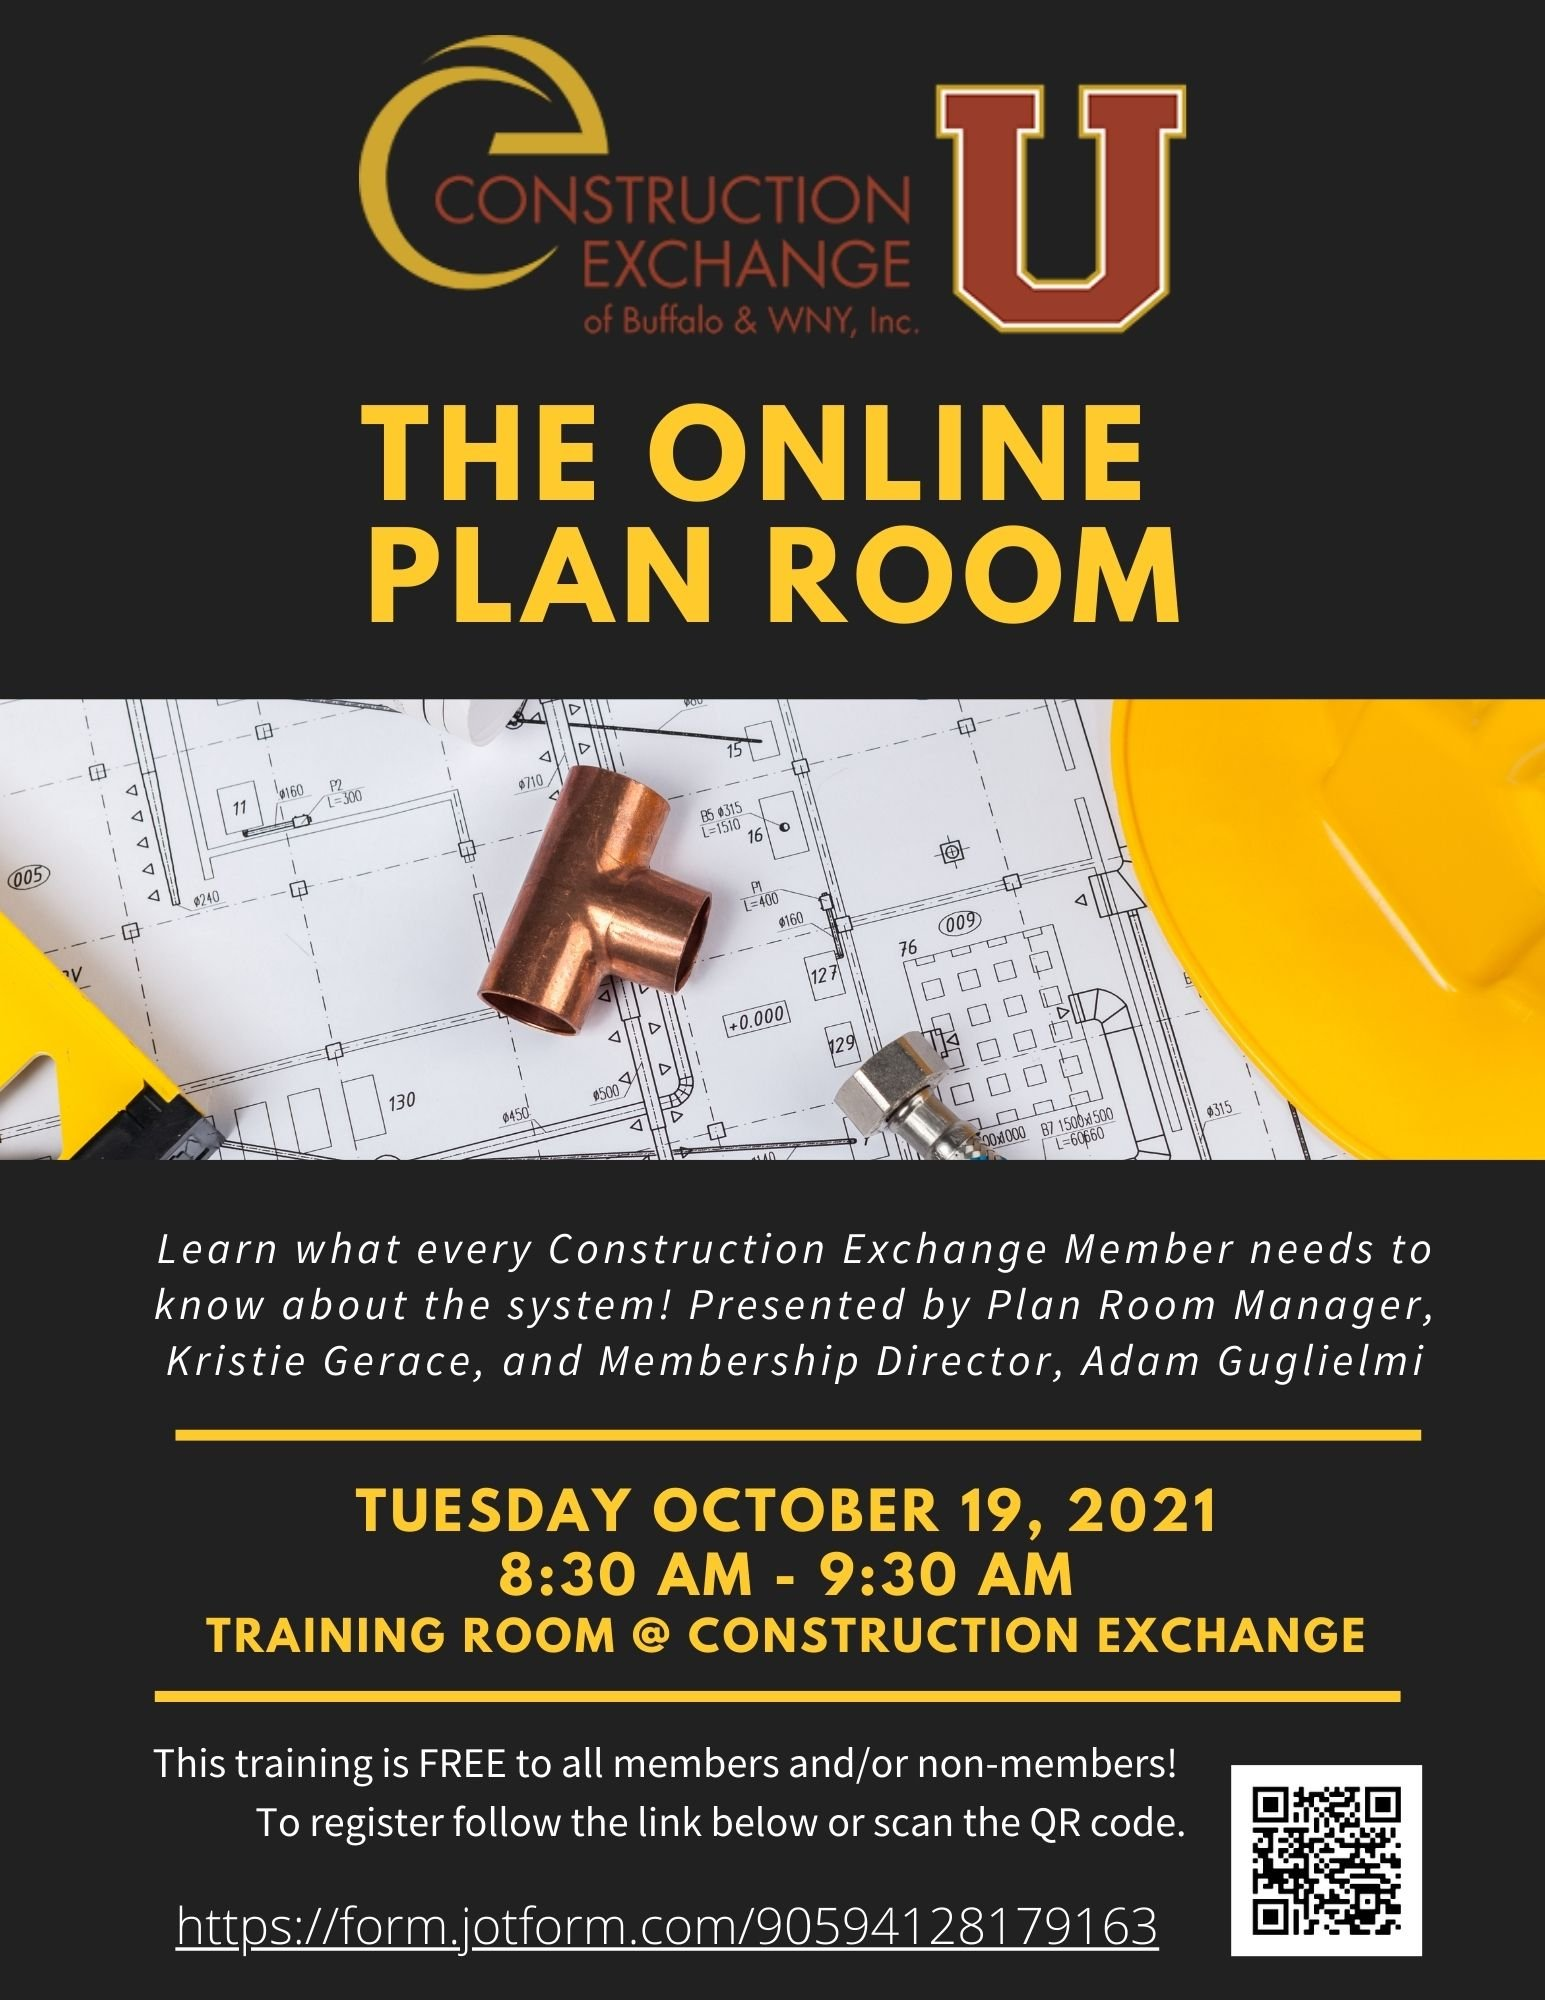 The Online Plan Room